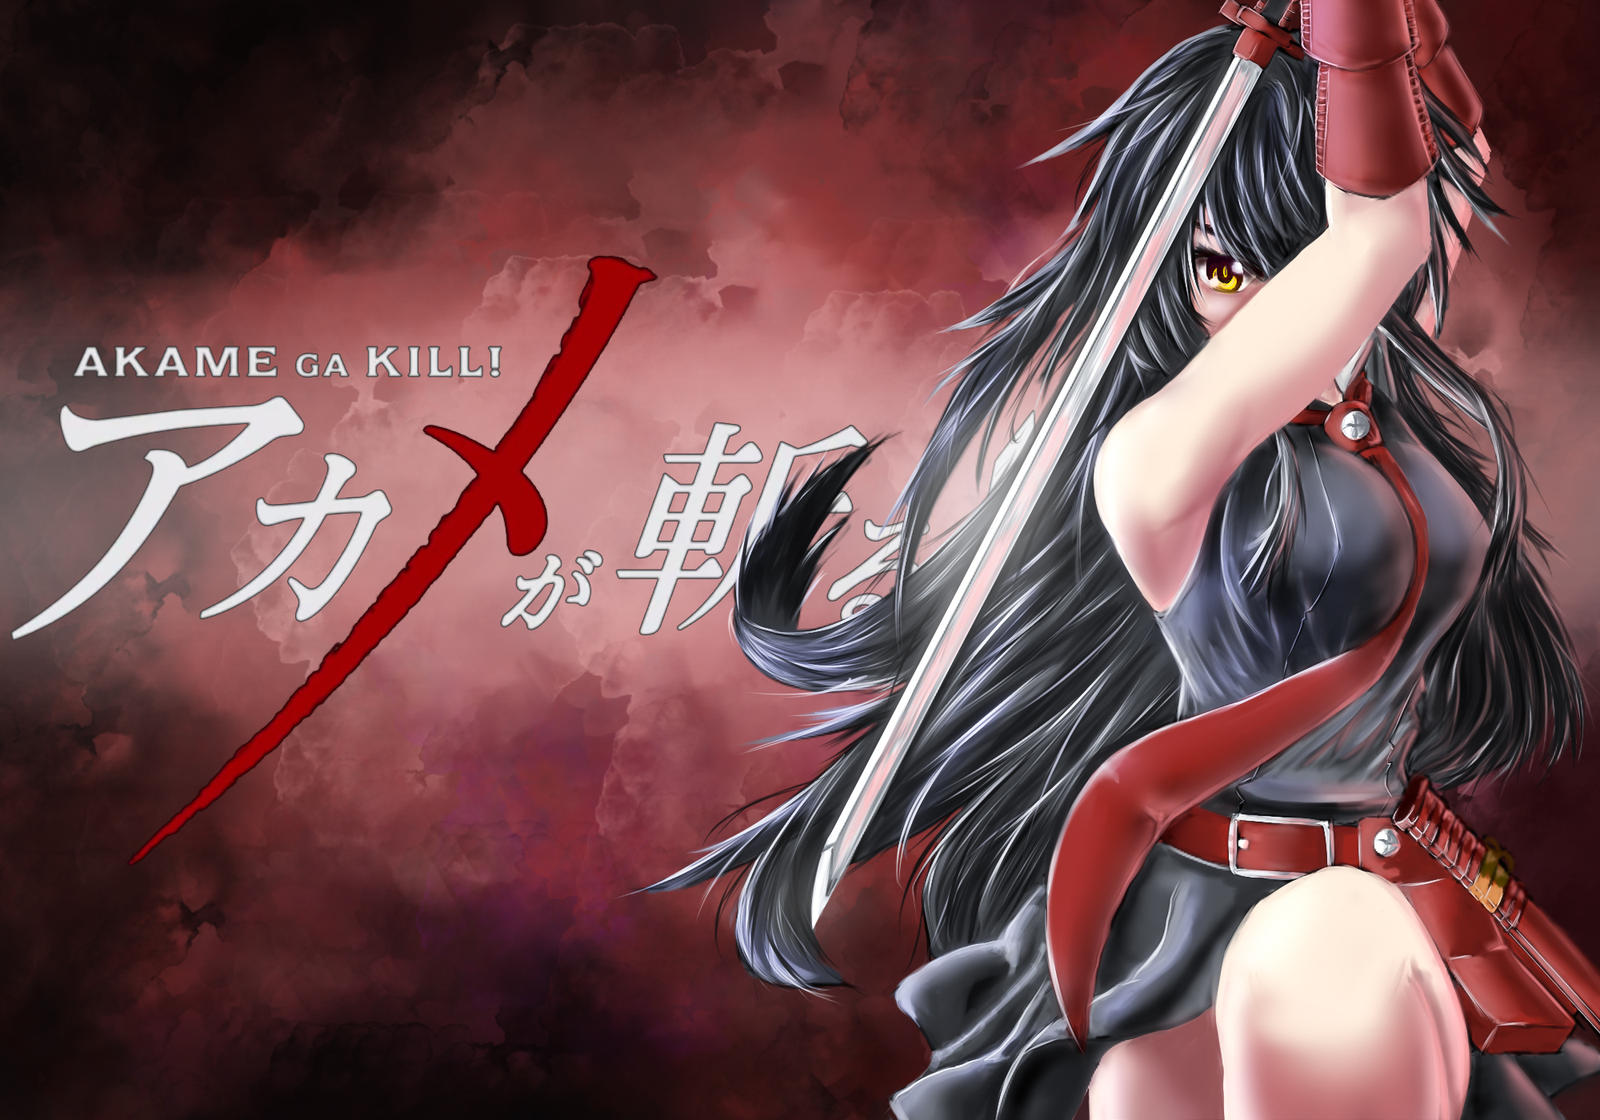 Akame Ga Kill Wallpaper: Akame Ga Kill Wallpaper By Nai-Shiro On DeviantArt